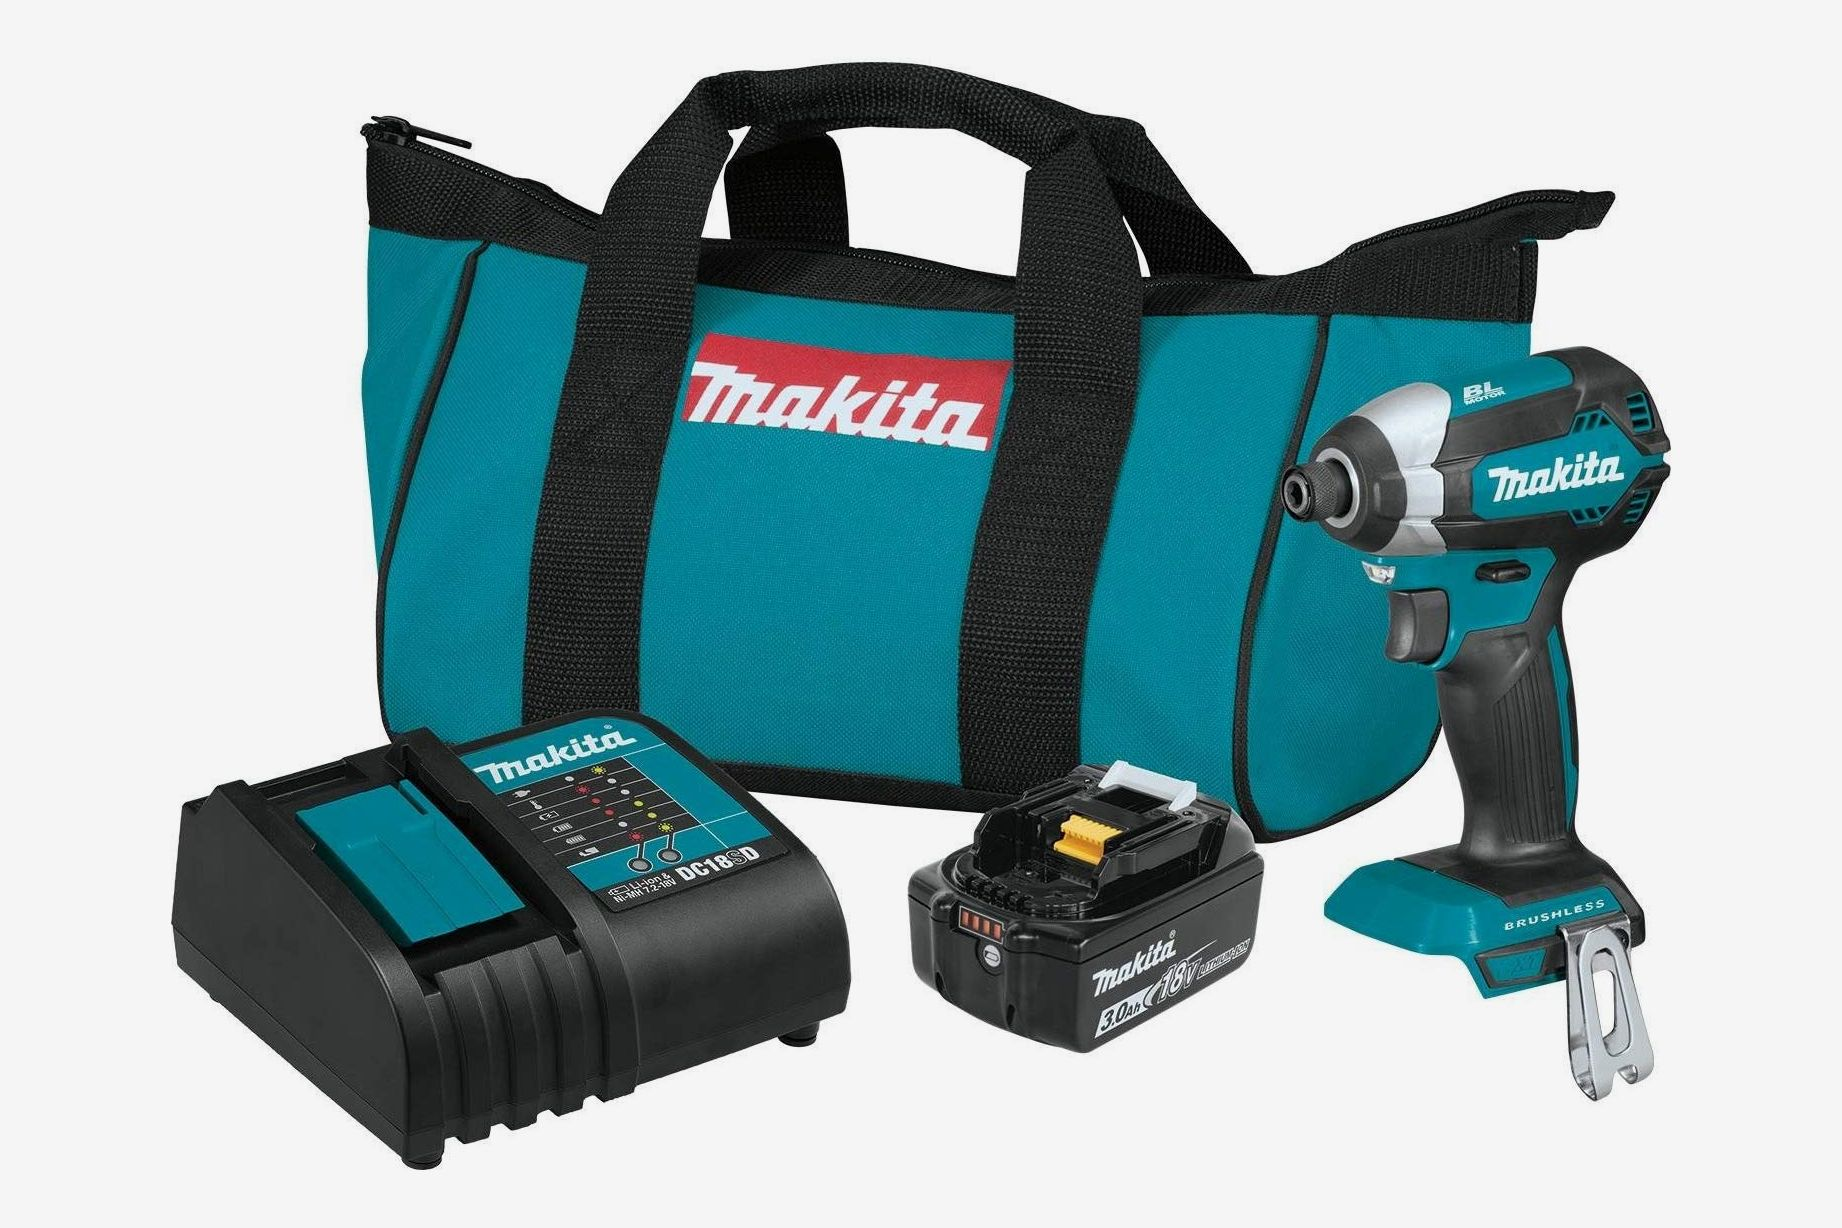 Makita Lithium-Ion Brushless Cordless Impact Driver Kit